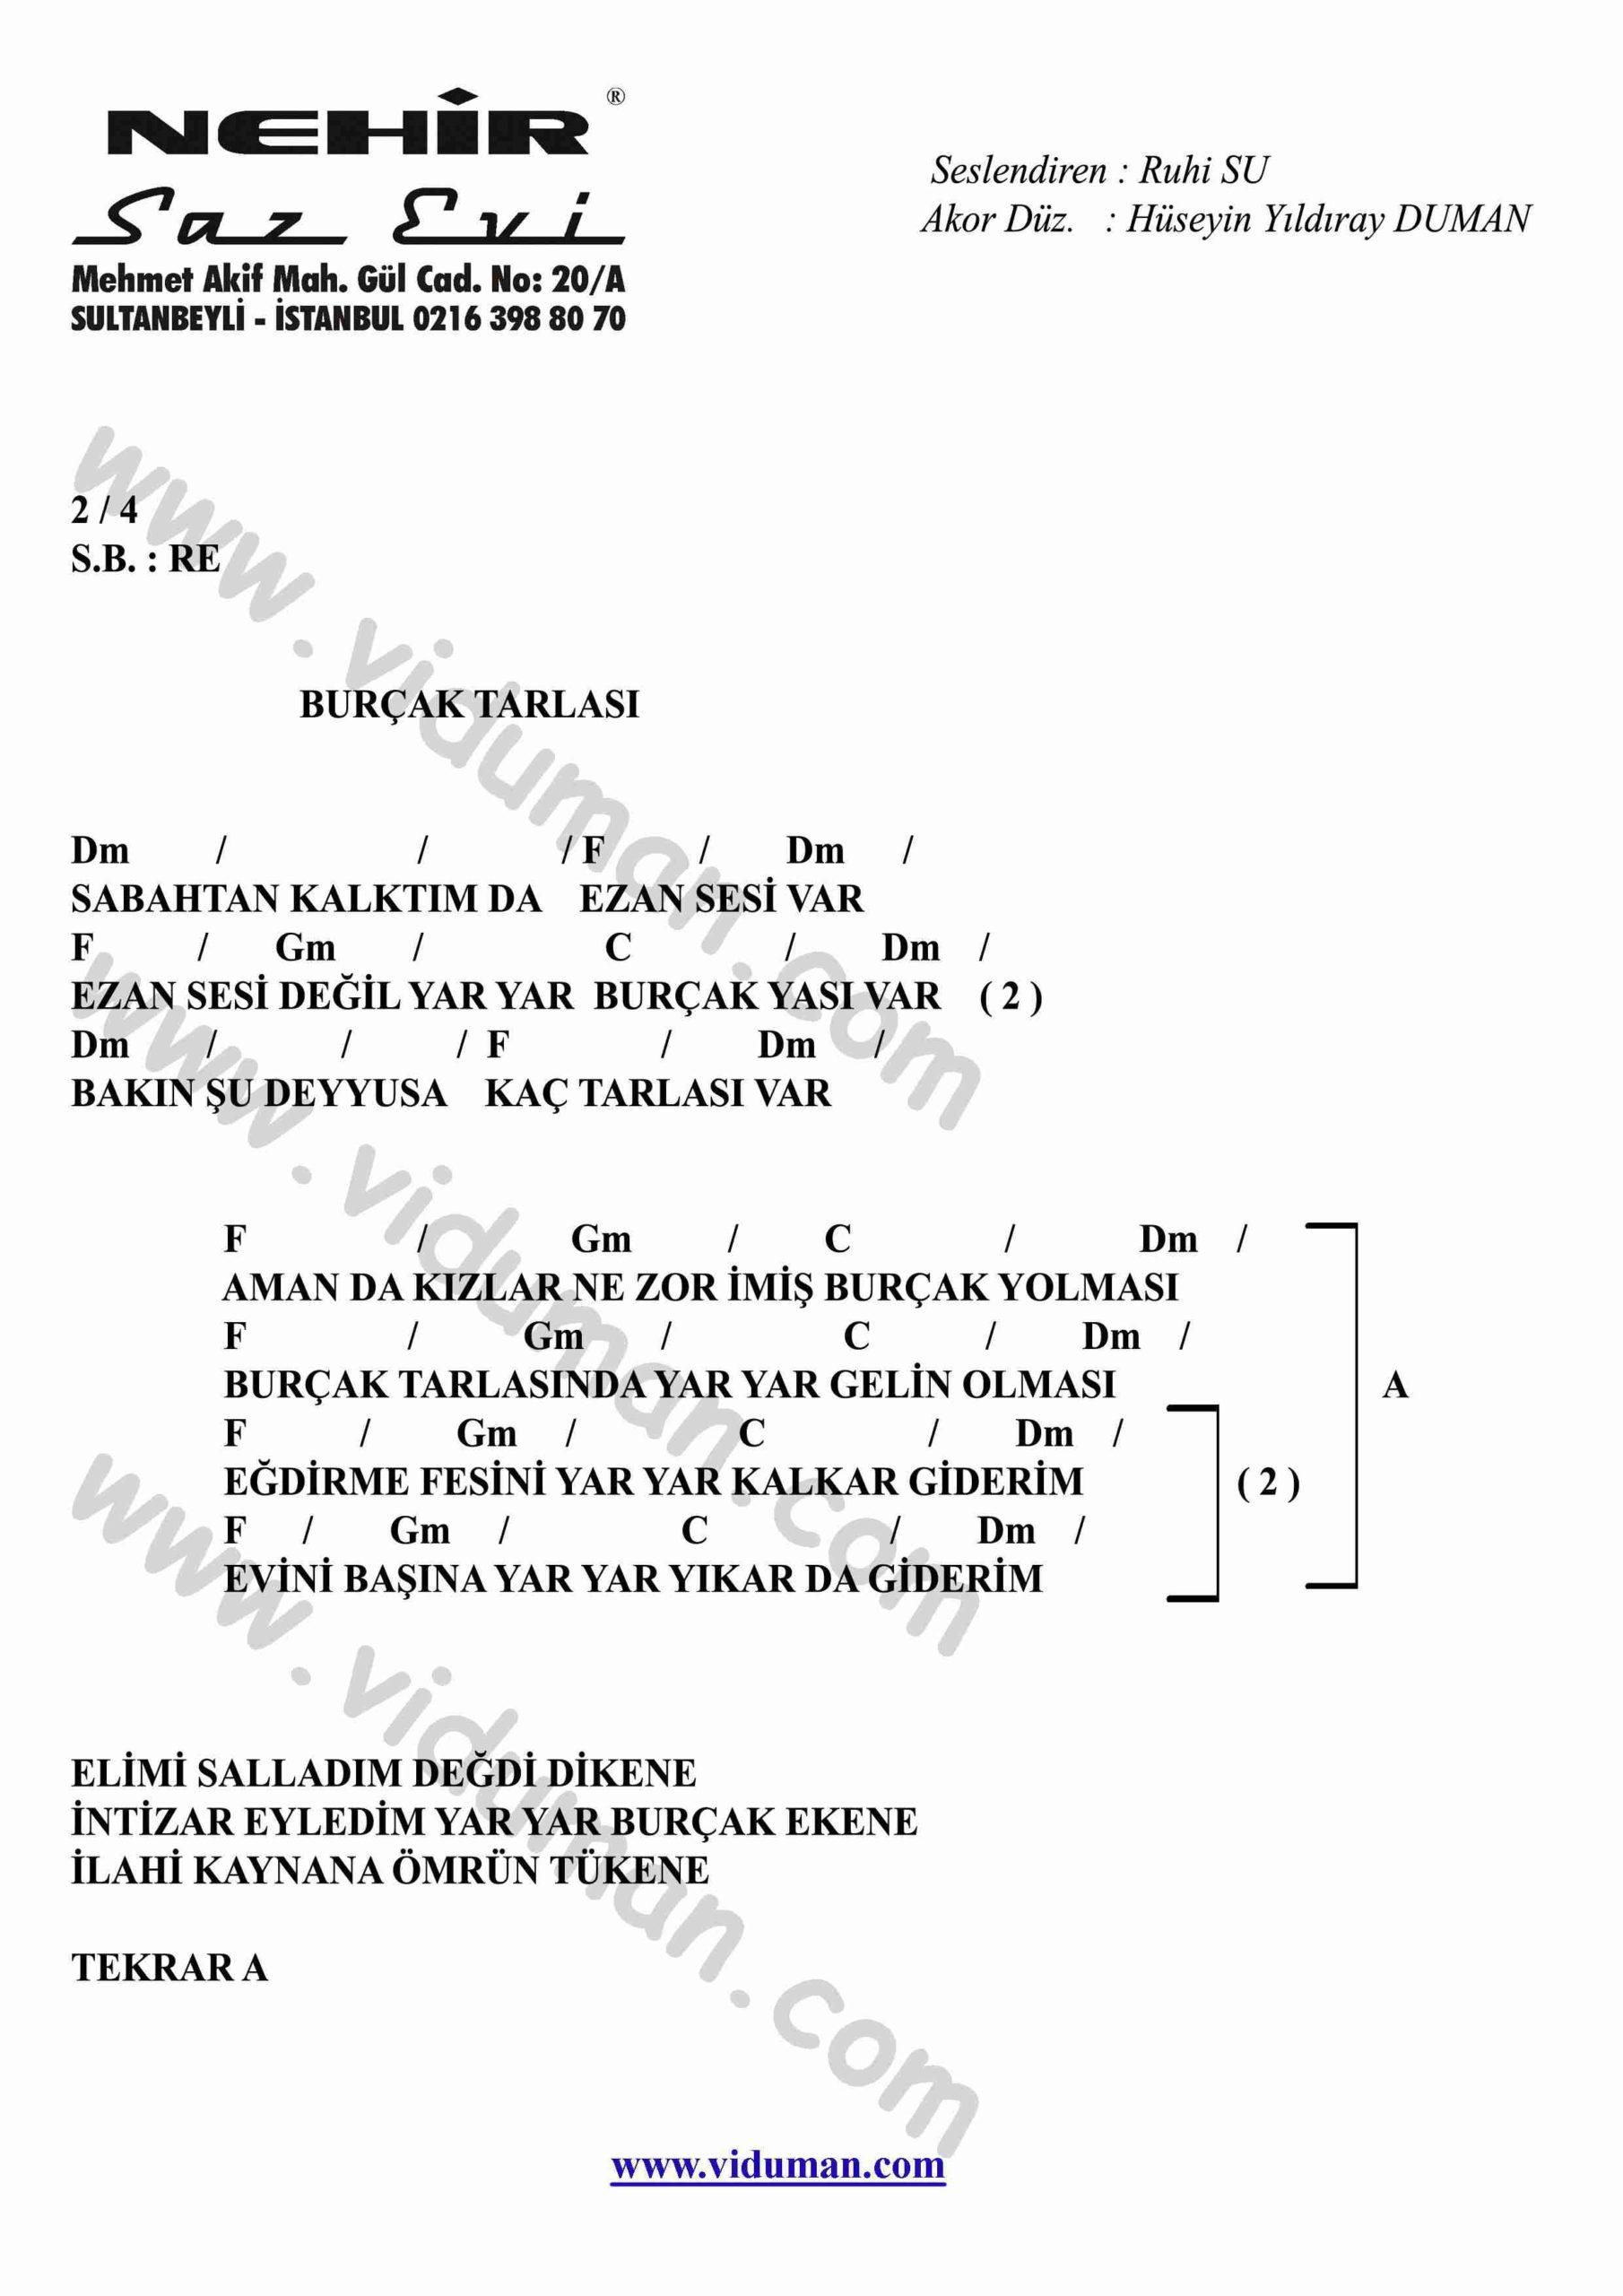 Burcak Tarlasi-Gitar-Ritim-Akorlari